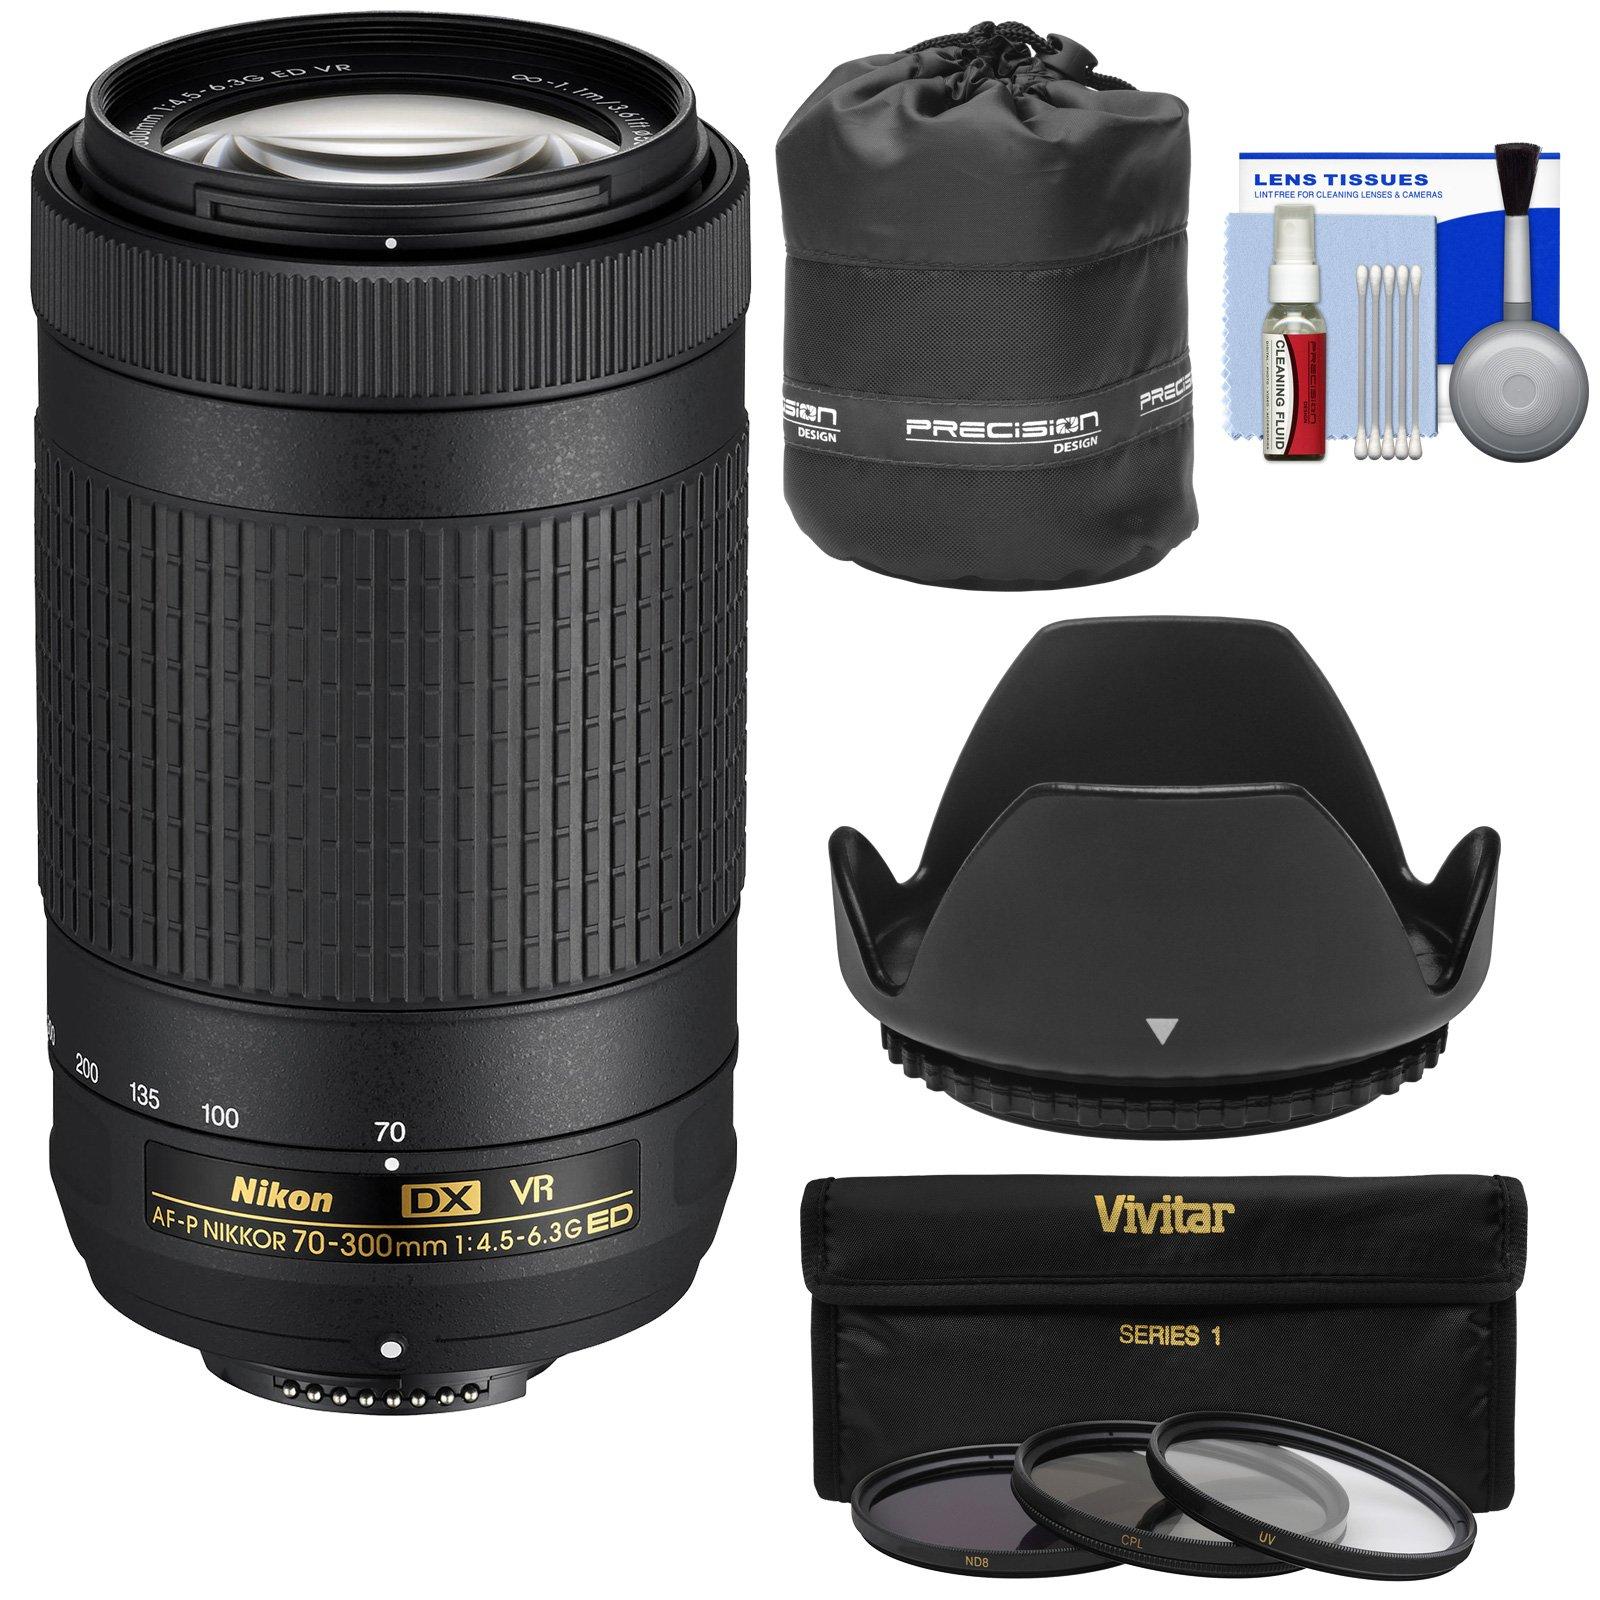 Nikon 70-300mm f/4.5-6.3G VR DX AF-P ED Zoom-Nikkor Lens with 3 UV/CPL/ND8 Filters + Hood + Pouch + Kit (Renewed)